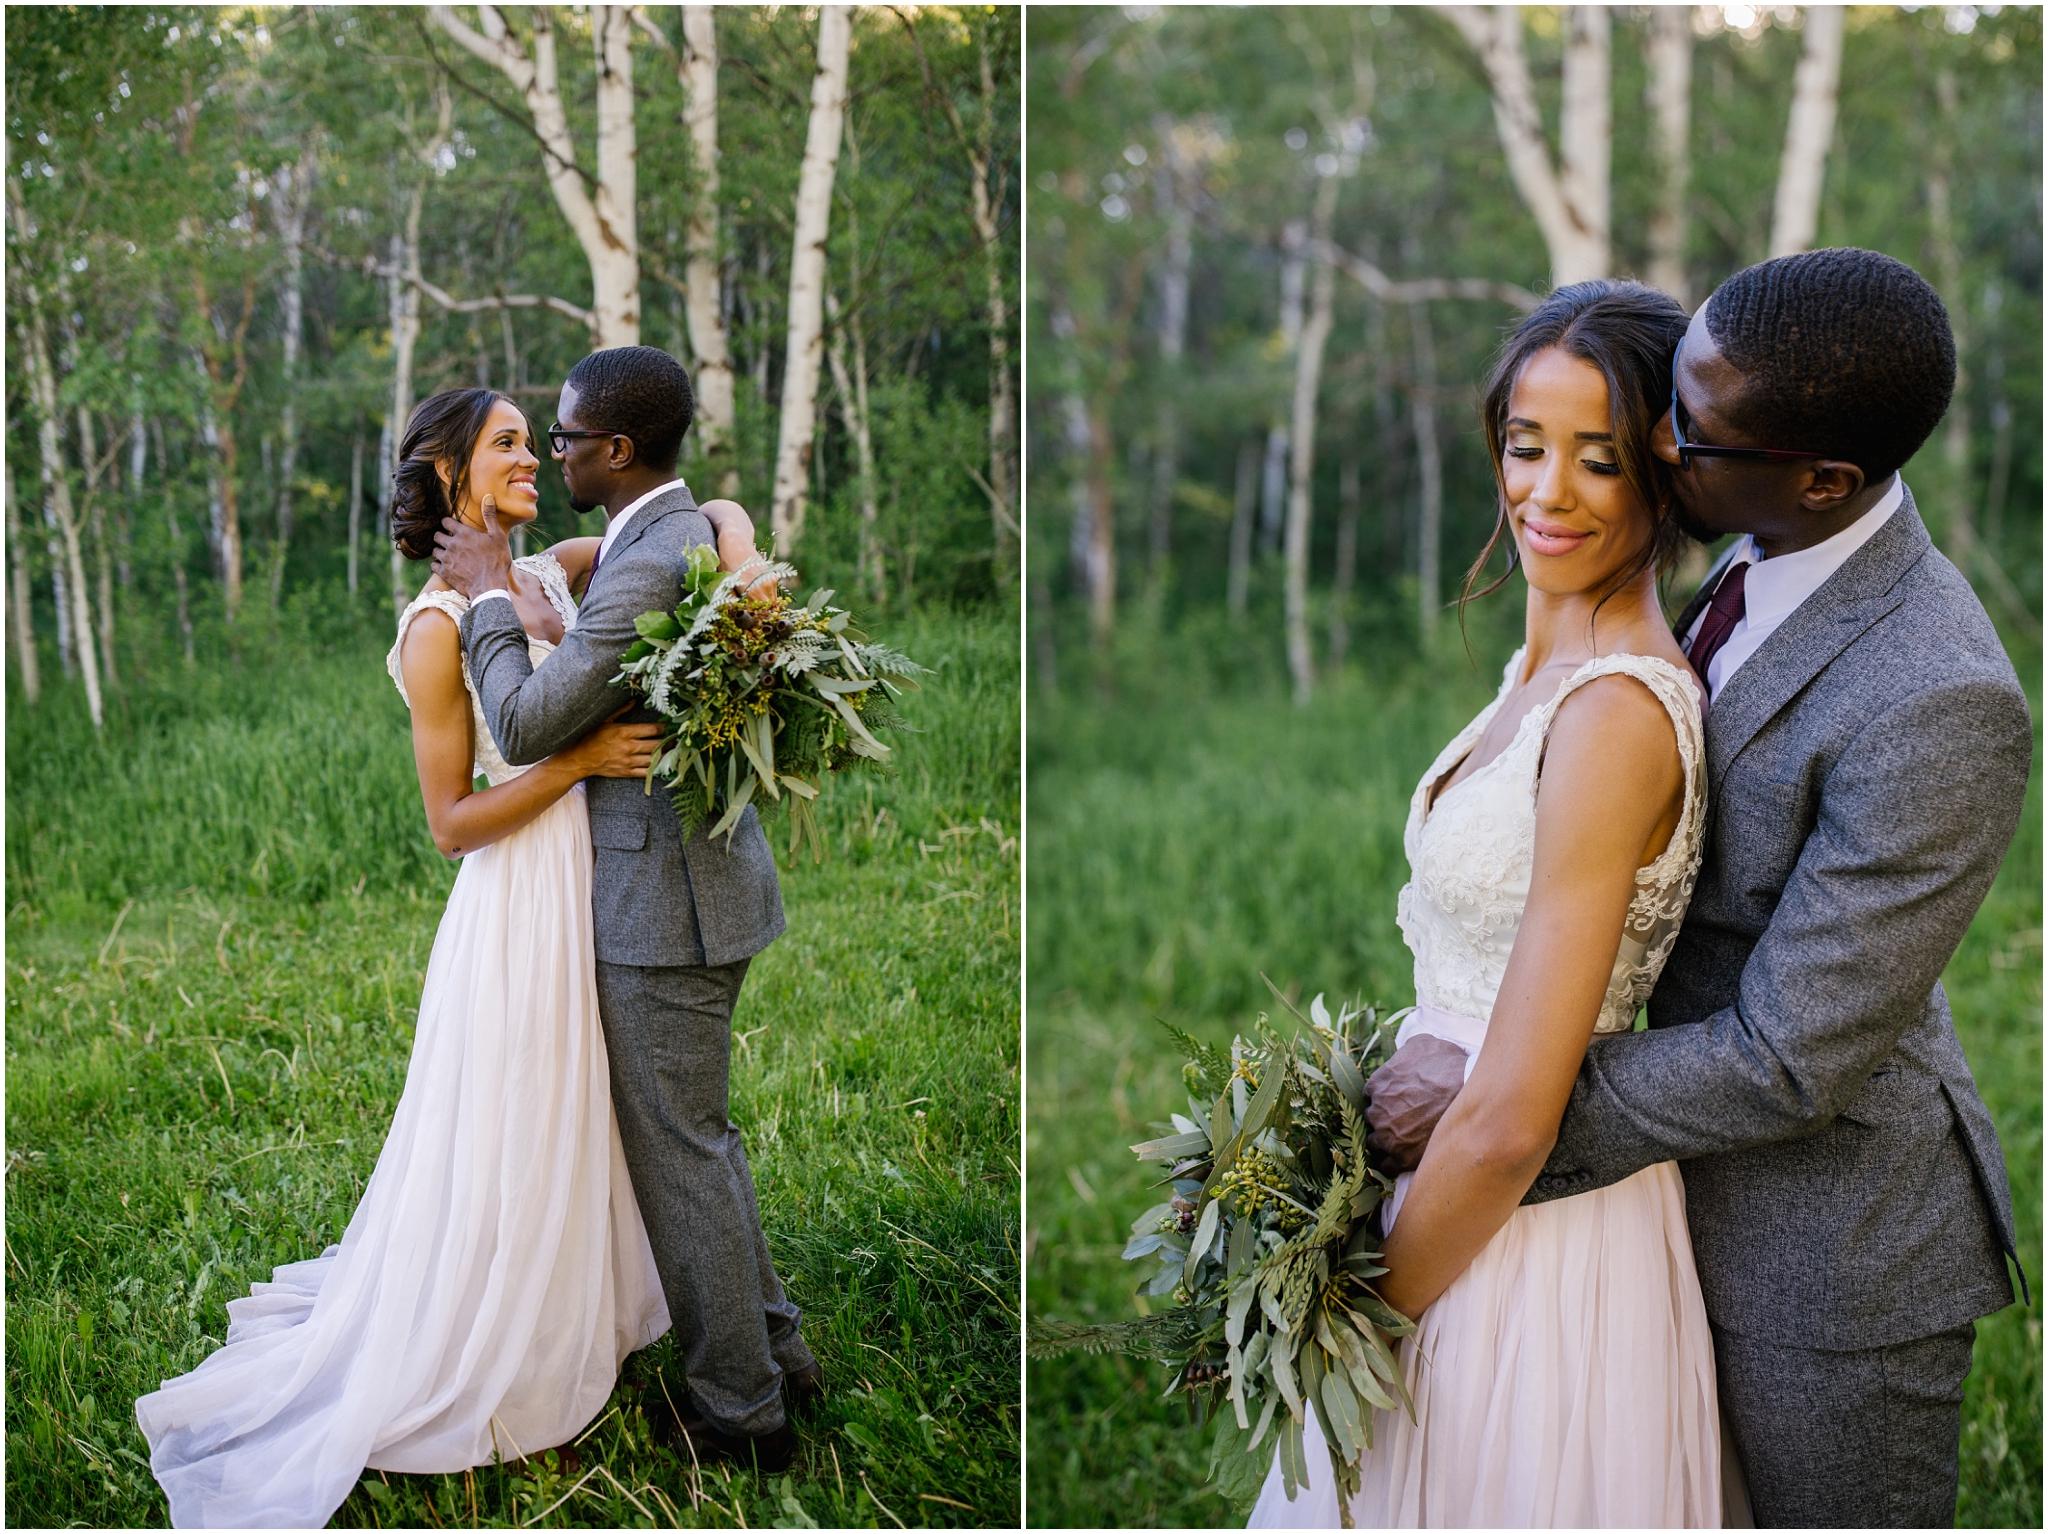 TreeHorseShoot-58_Lizzie-B-Imagery-Utah-Wedding-Photographer-Salt-Lake-City-Park-City-Oakley.jpg